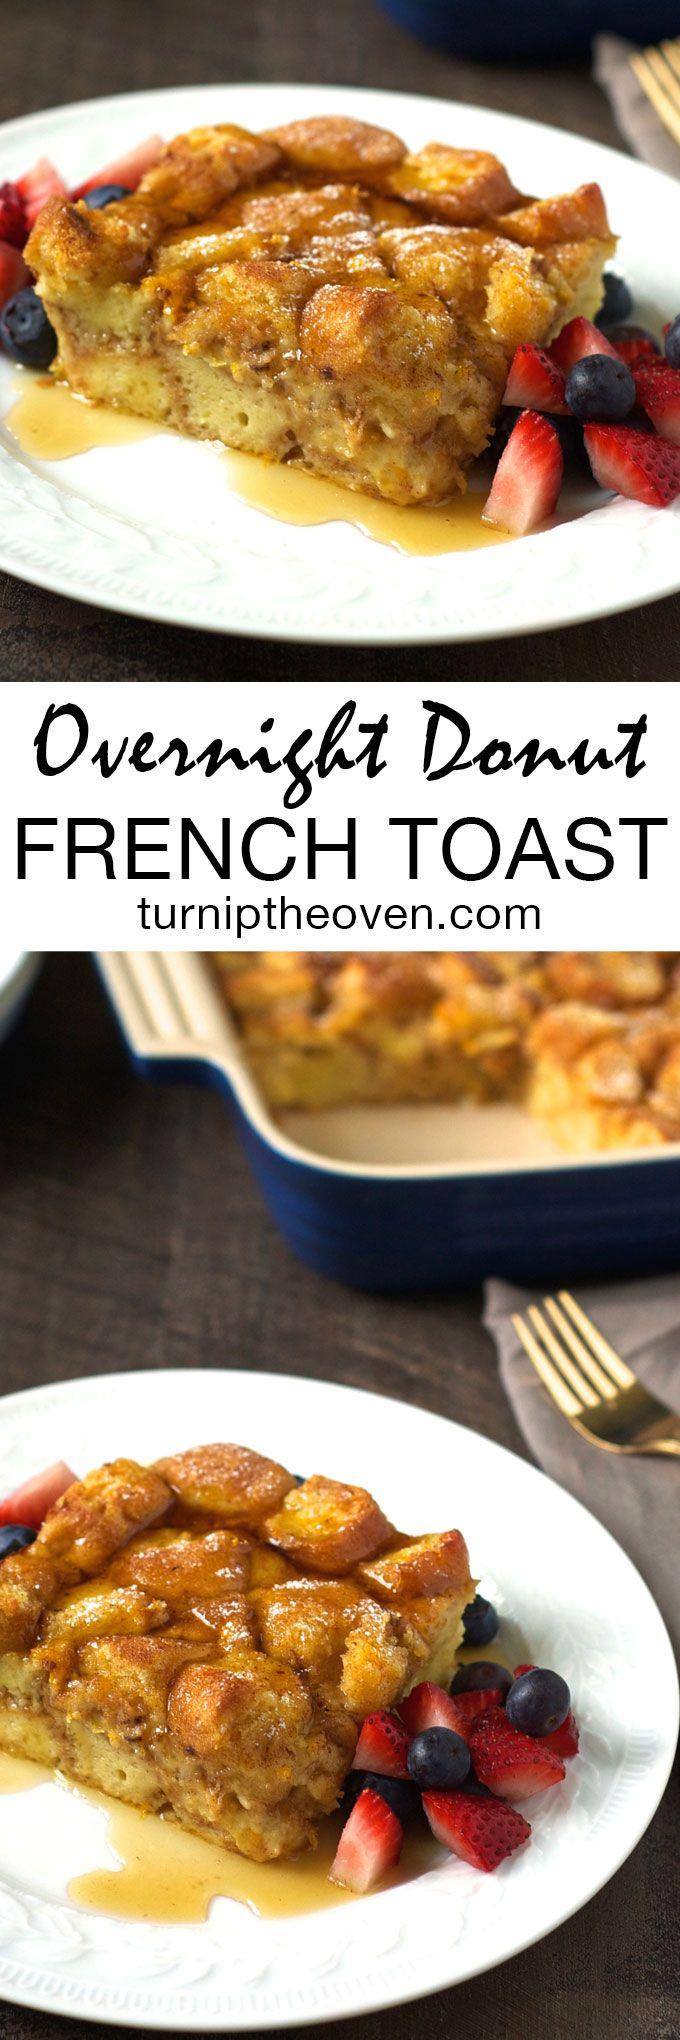 Casserole With Bread on Pinterest | Breakfast Casserole, Overnight ...